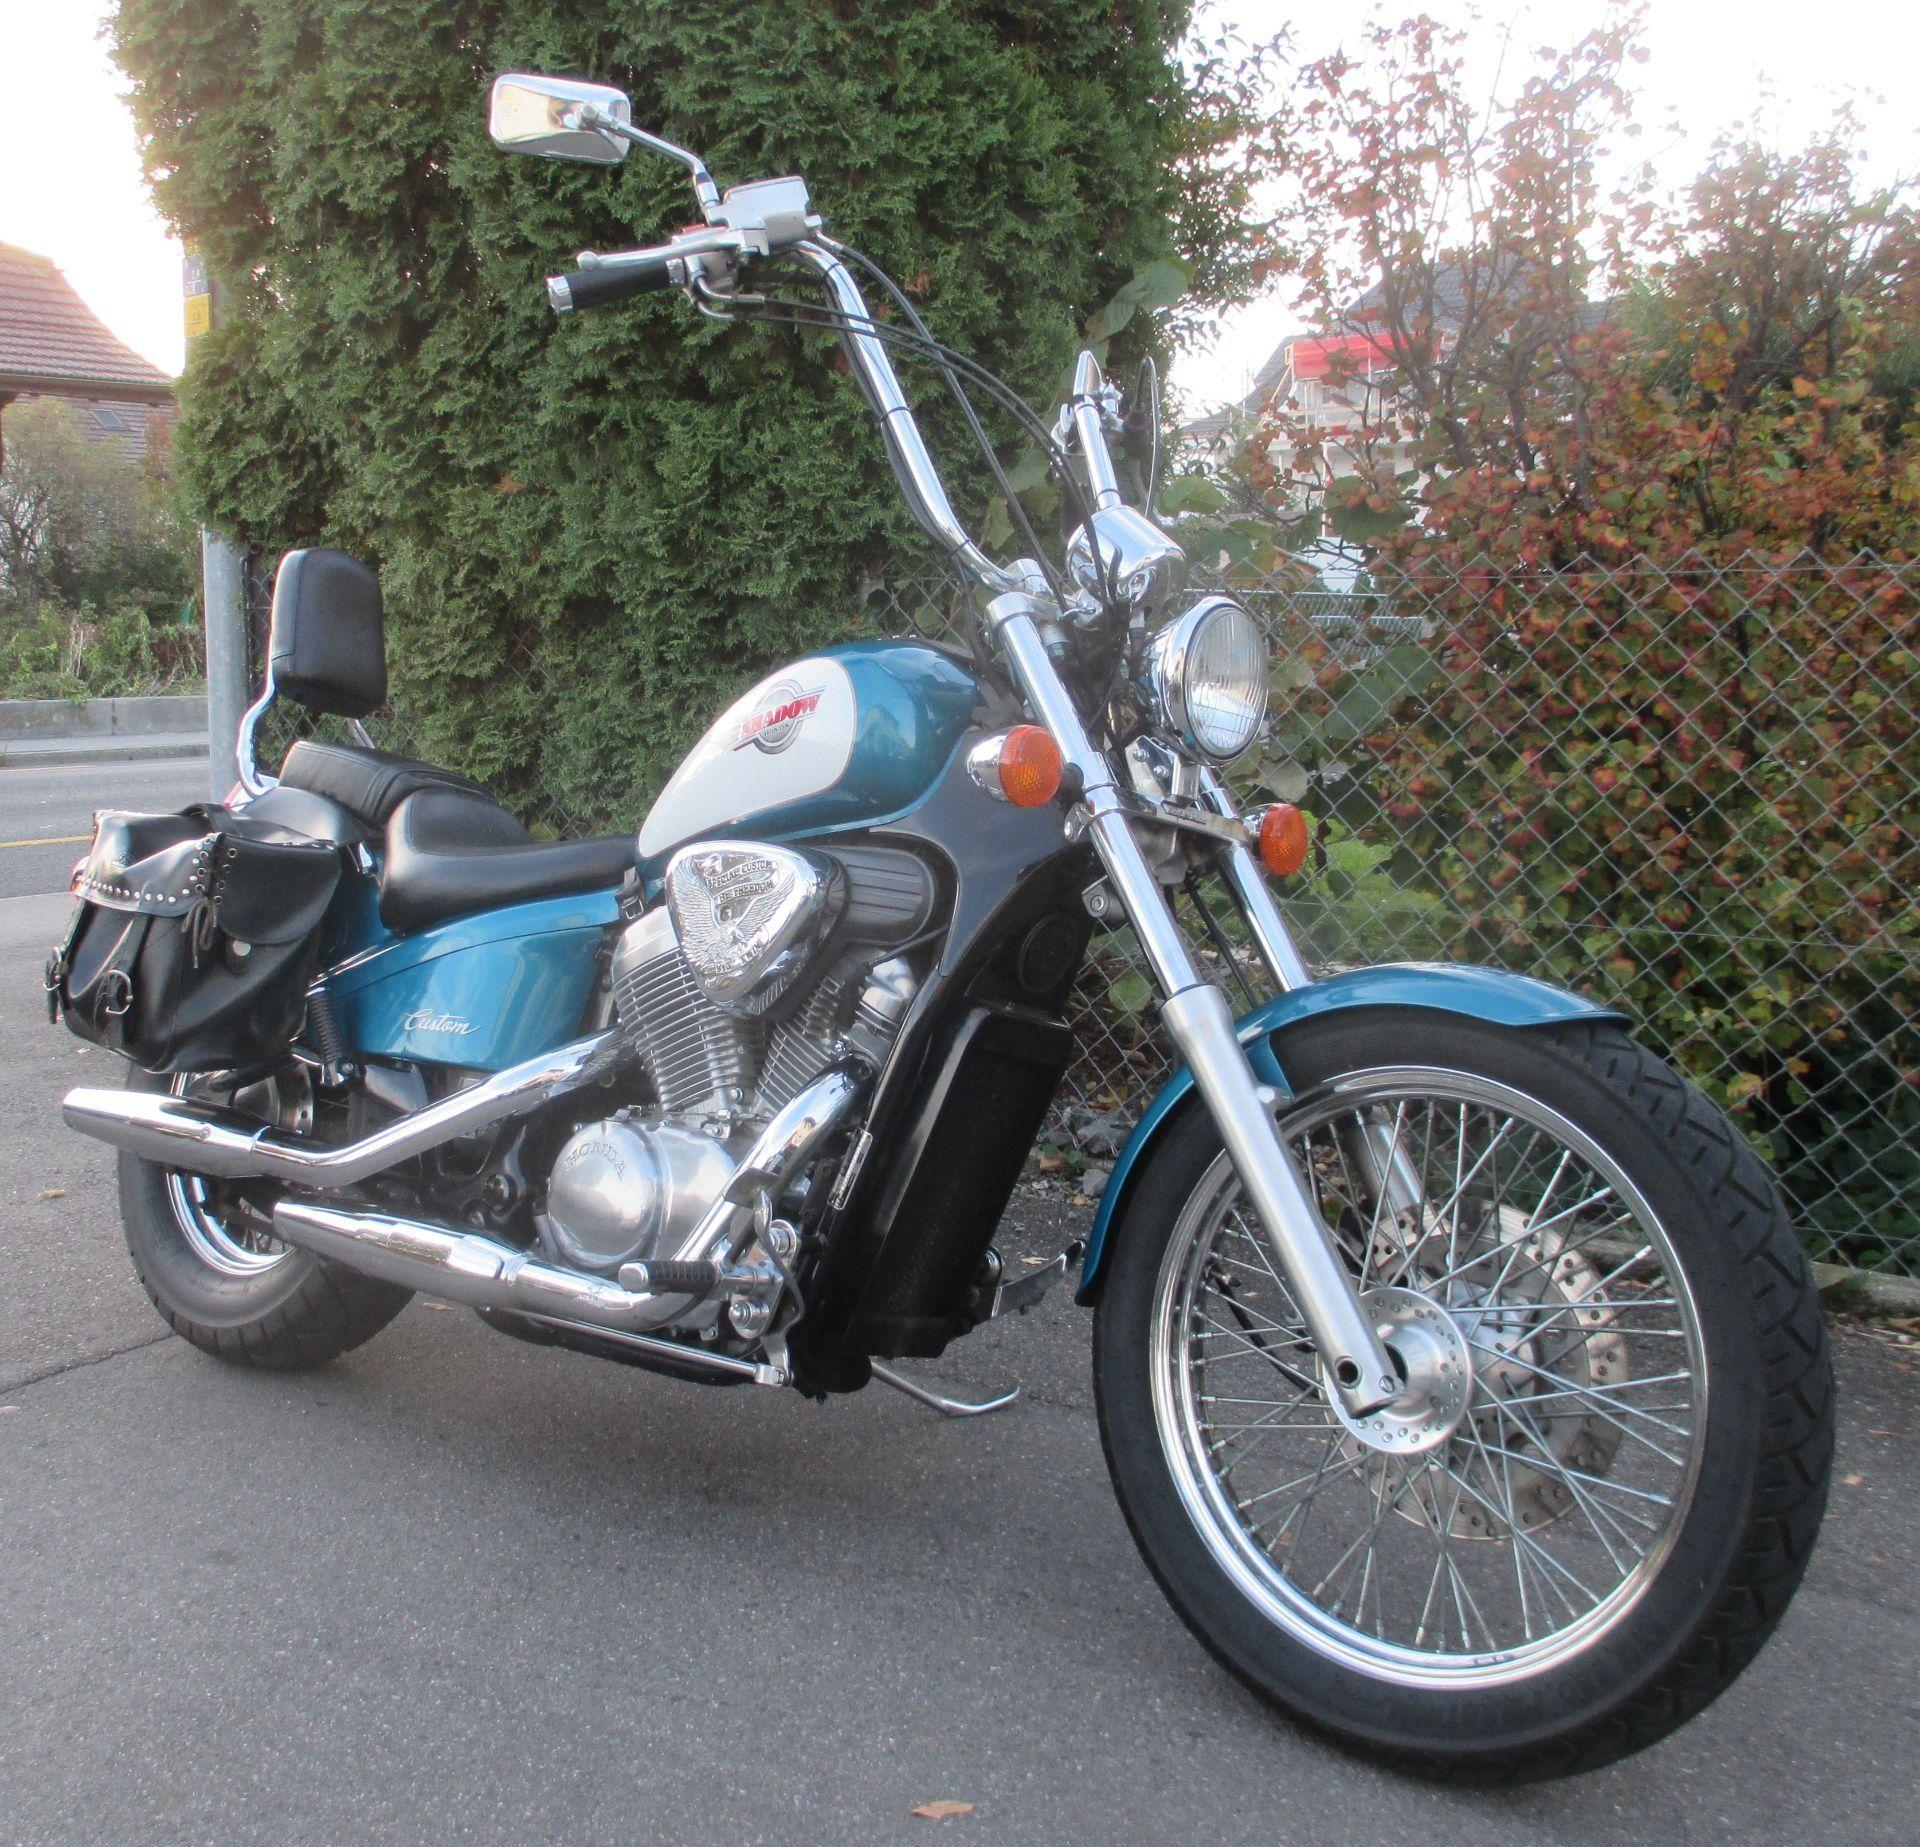 motorrad occasion kaufen honda vt 600 c shadow bikes 2 rock thun. Black Bedroom Furniture Sets. Home Design Ideas